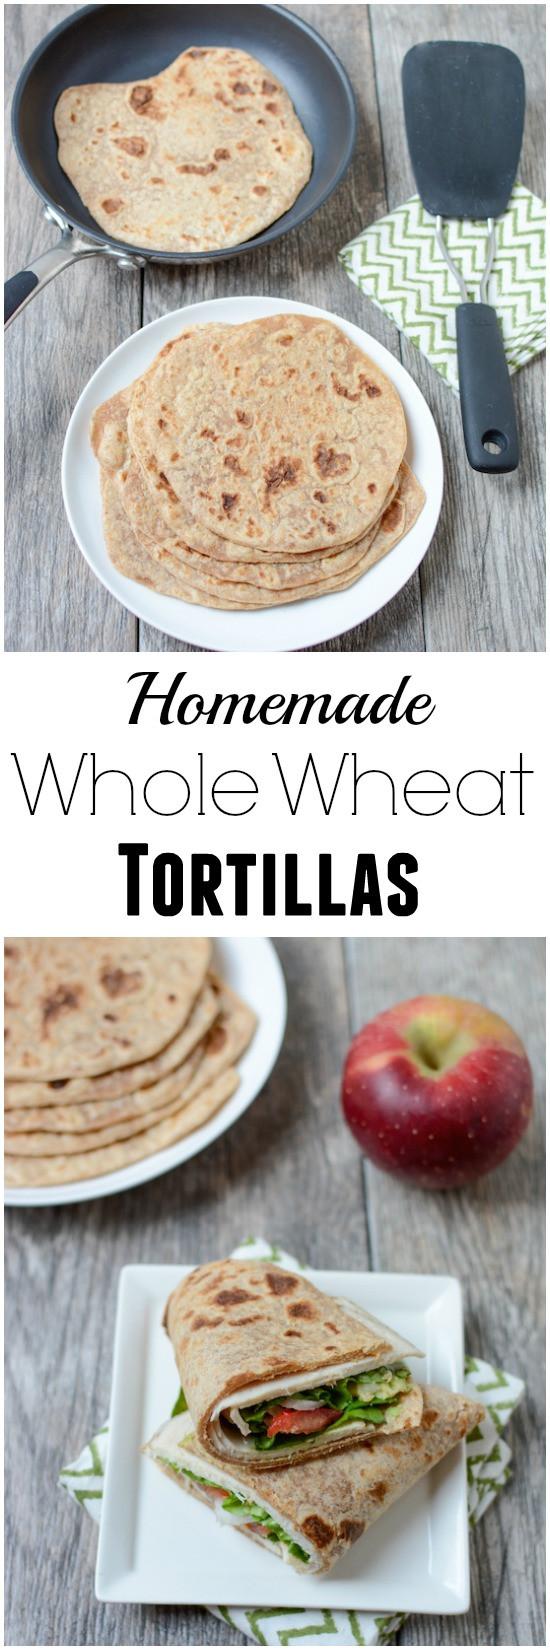 Are Corn Tortillas Healthy  Homemade Whole Wheat Tortillas Recipe